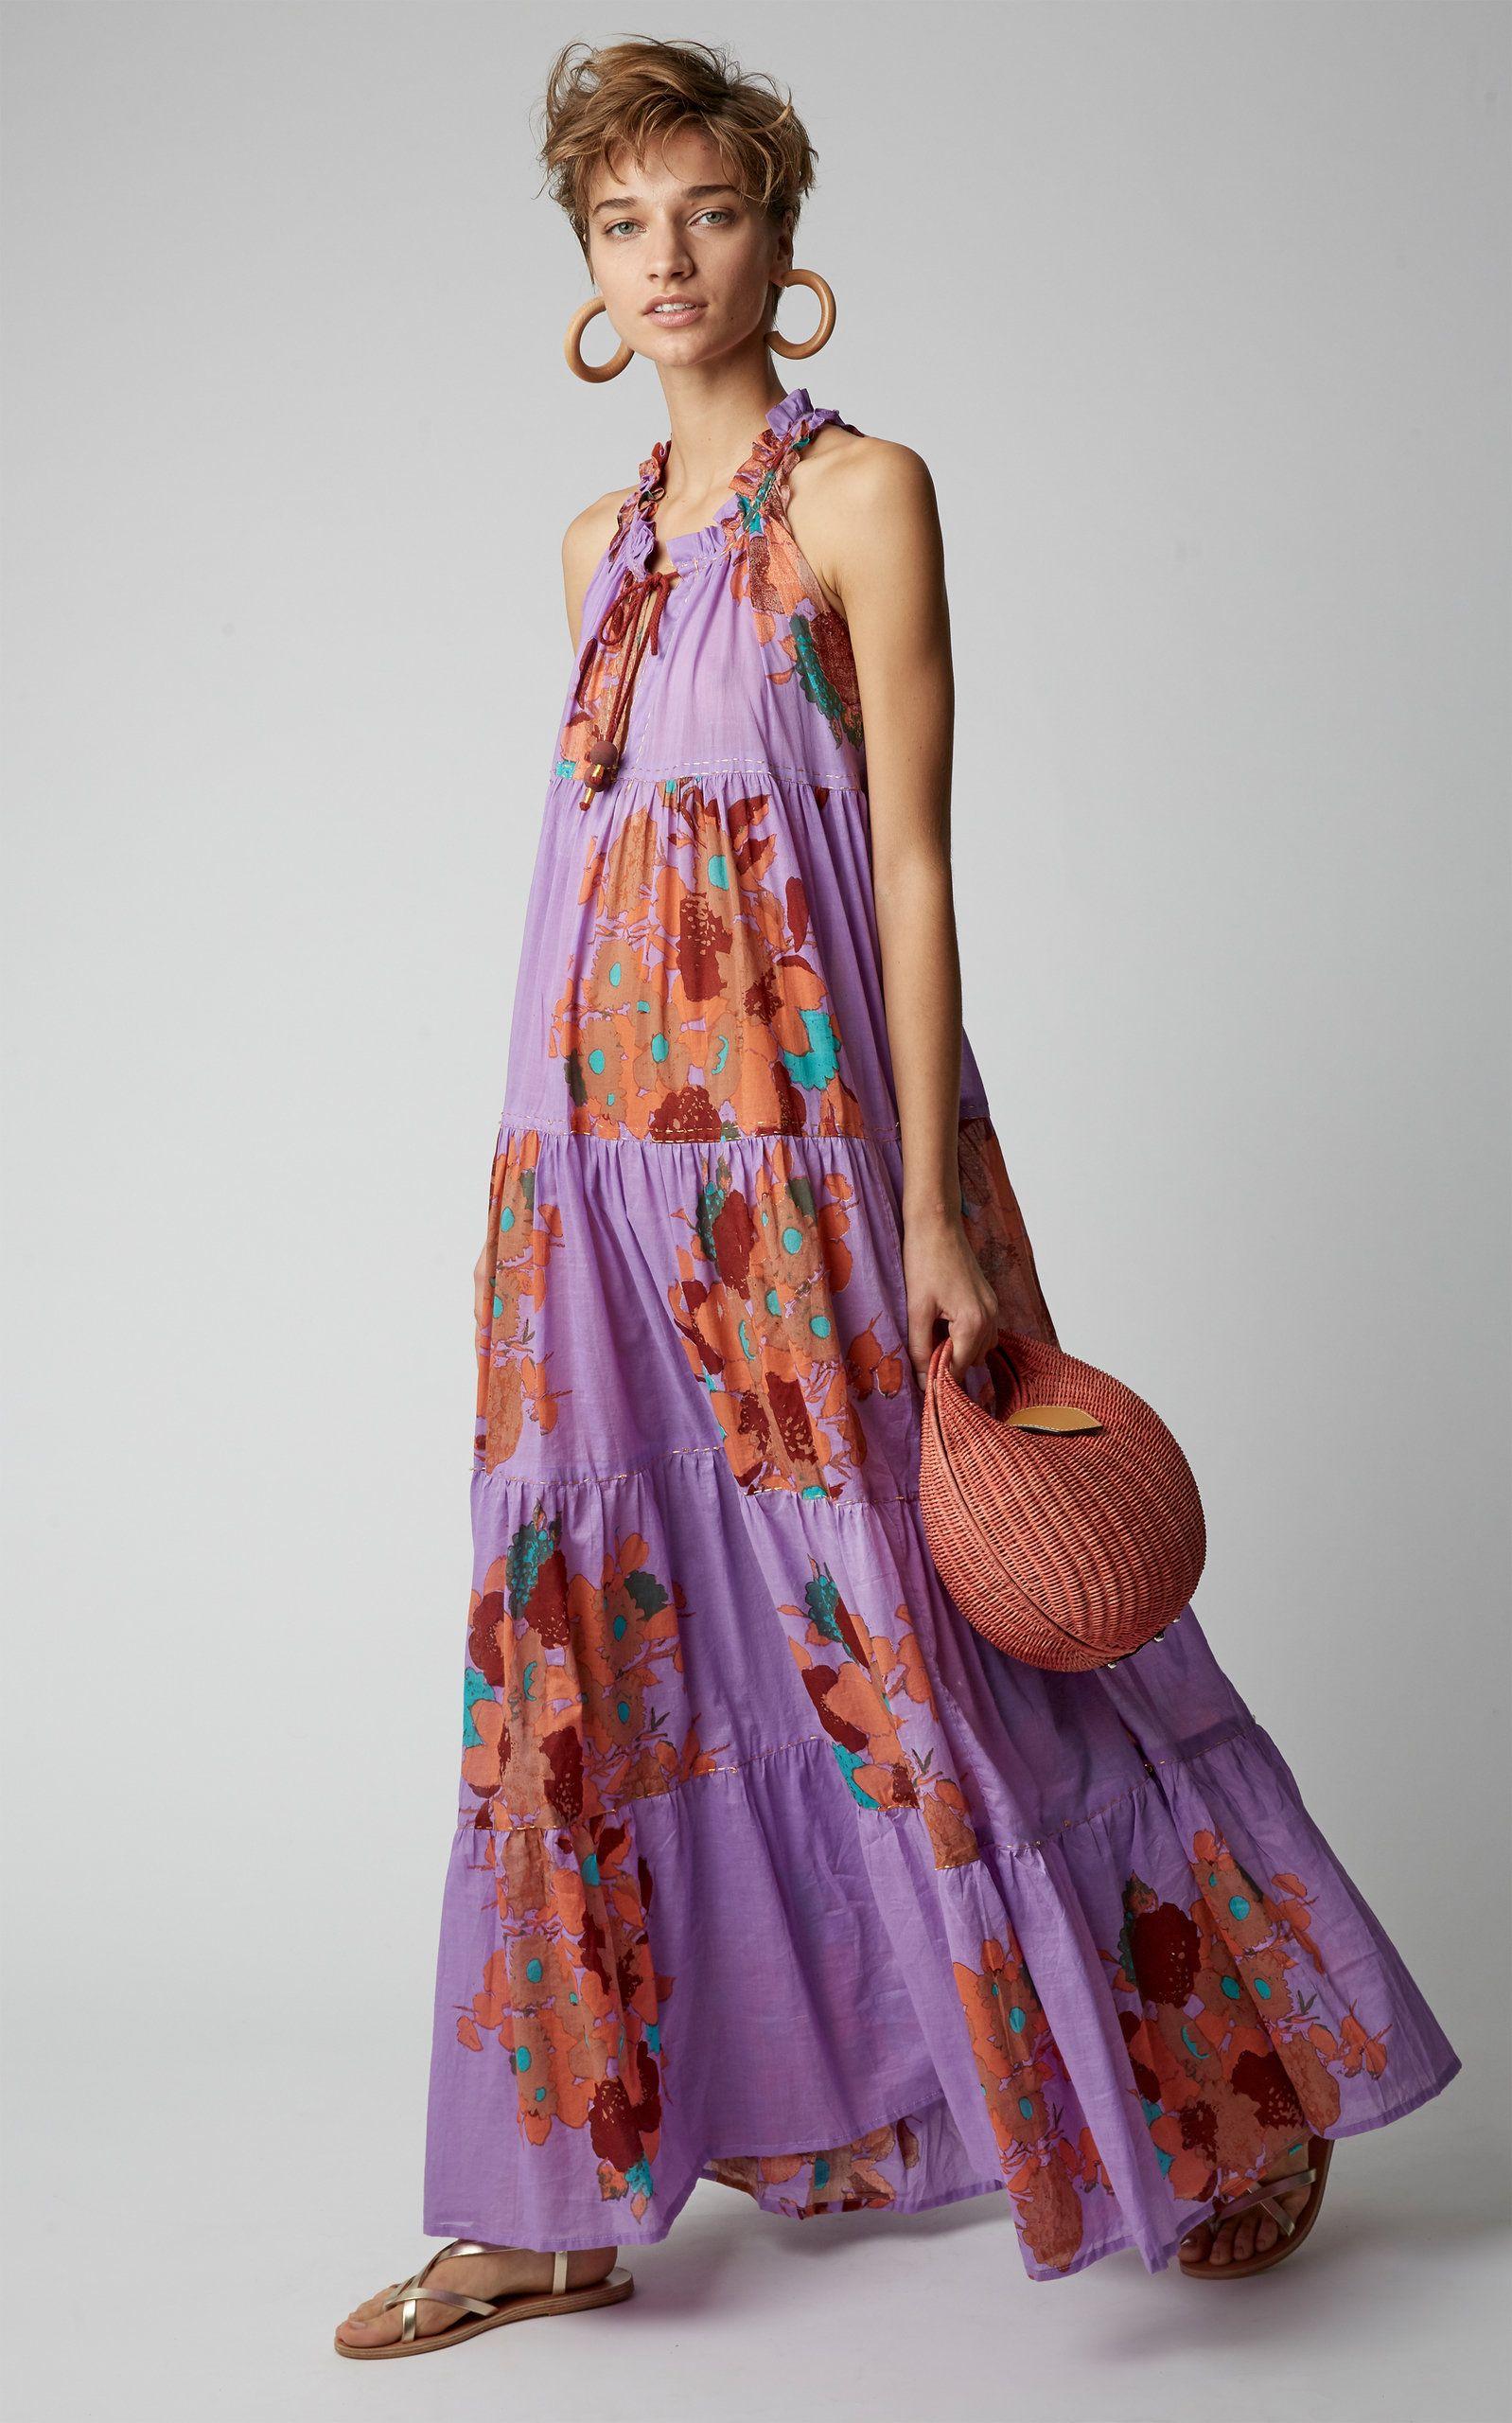 Love The Bag Earrings Tiered Dress Dep [ 2560 x 1598 Pixel ]